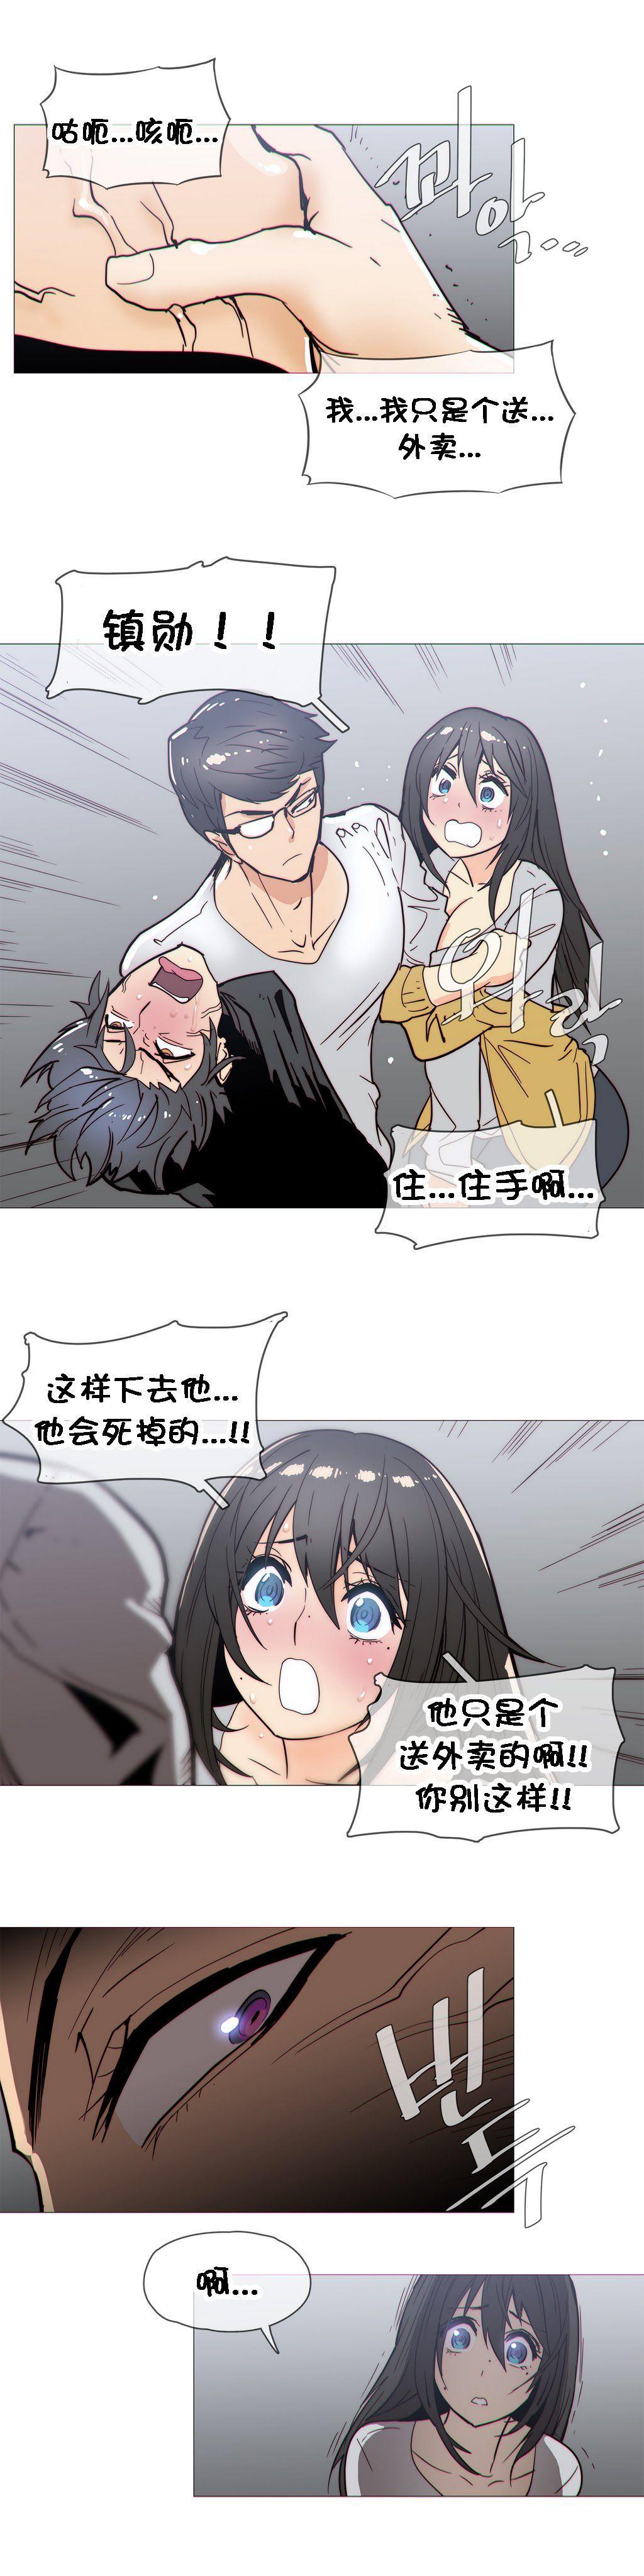 HouseHold Affairs 【卞赤鲤个人汉化】1~33话(持续更新中) 599